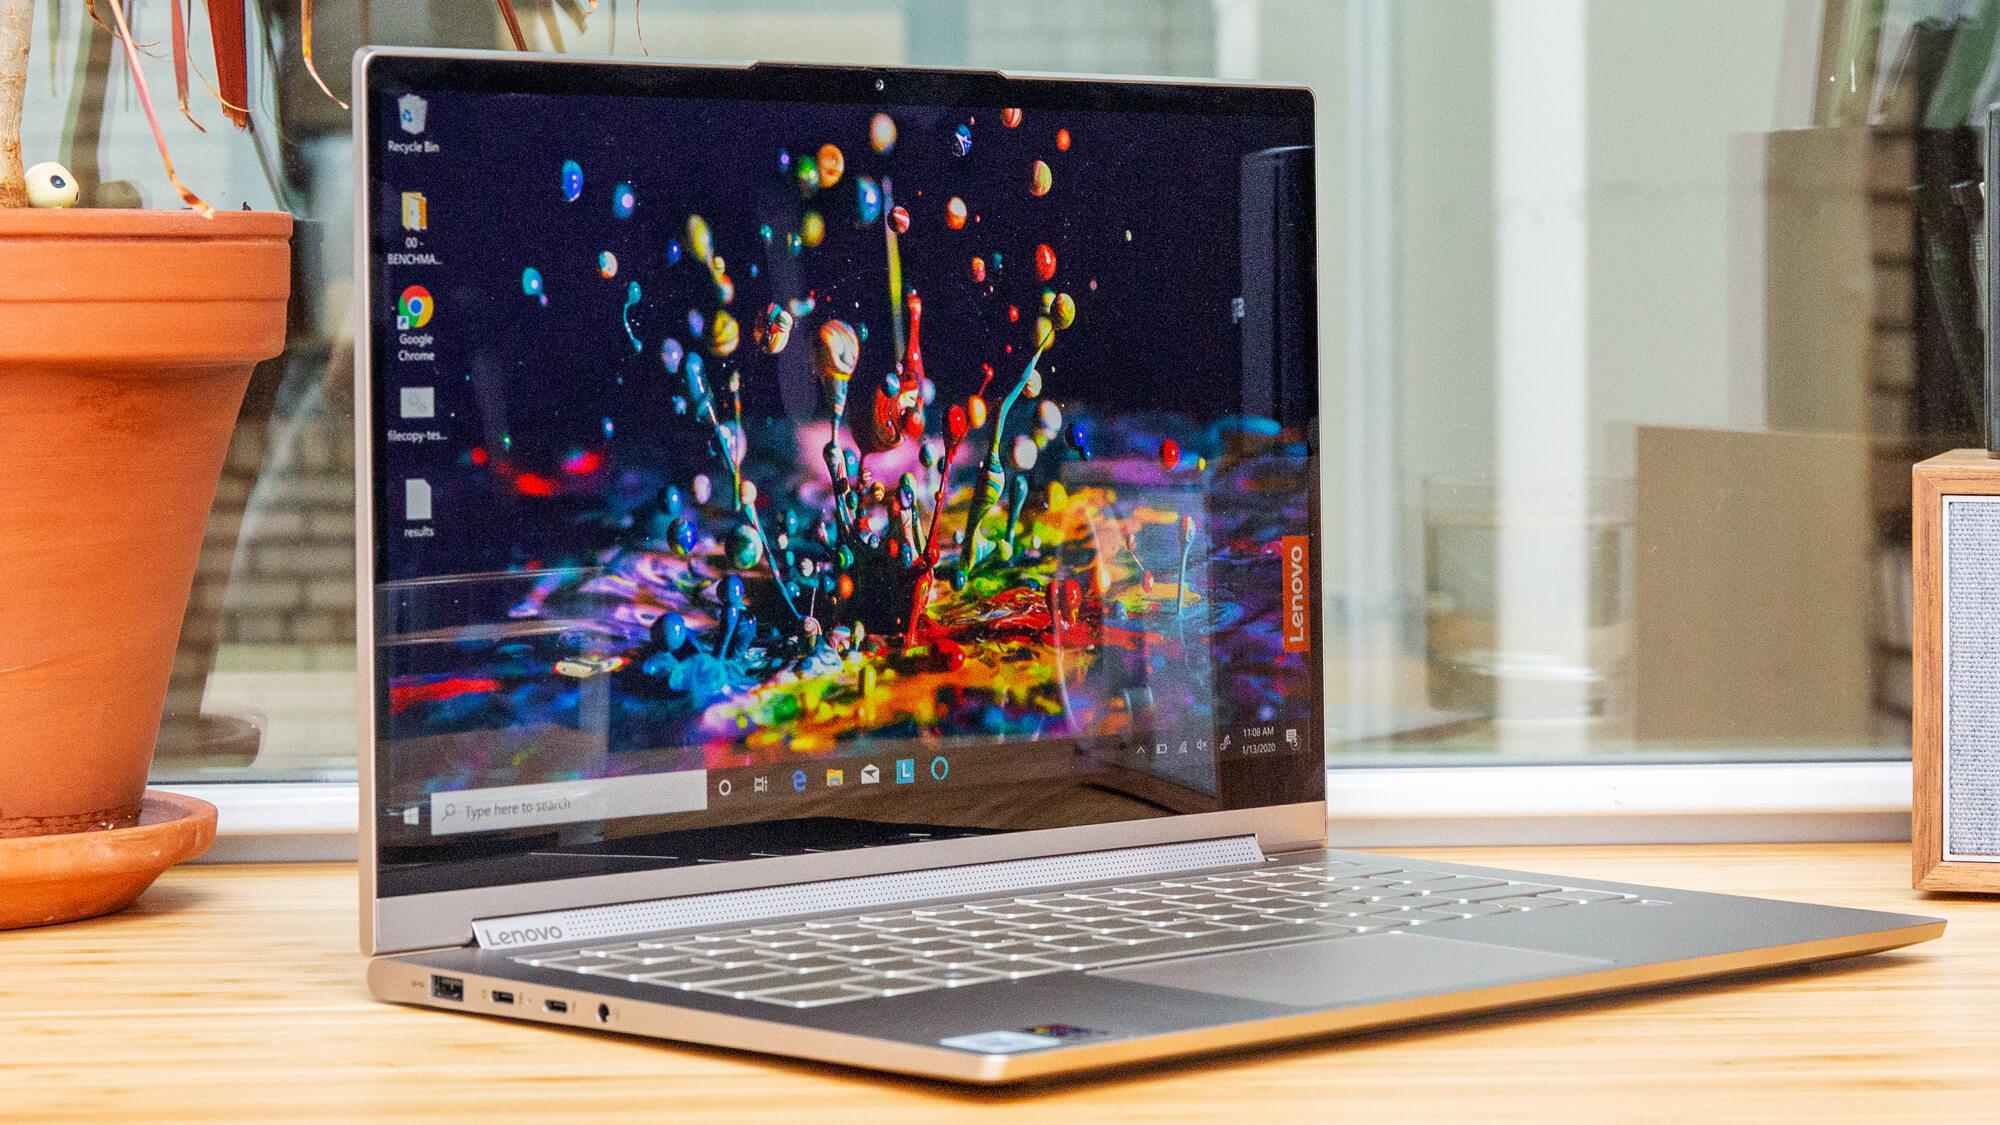 Tong hop 15 laptop tot nhat cho Sinh Vien 6